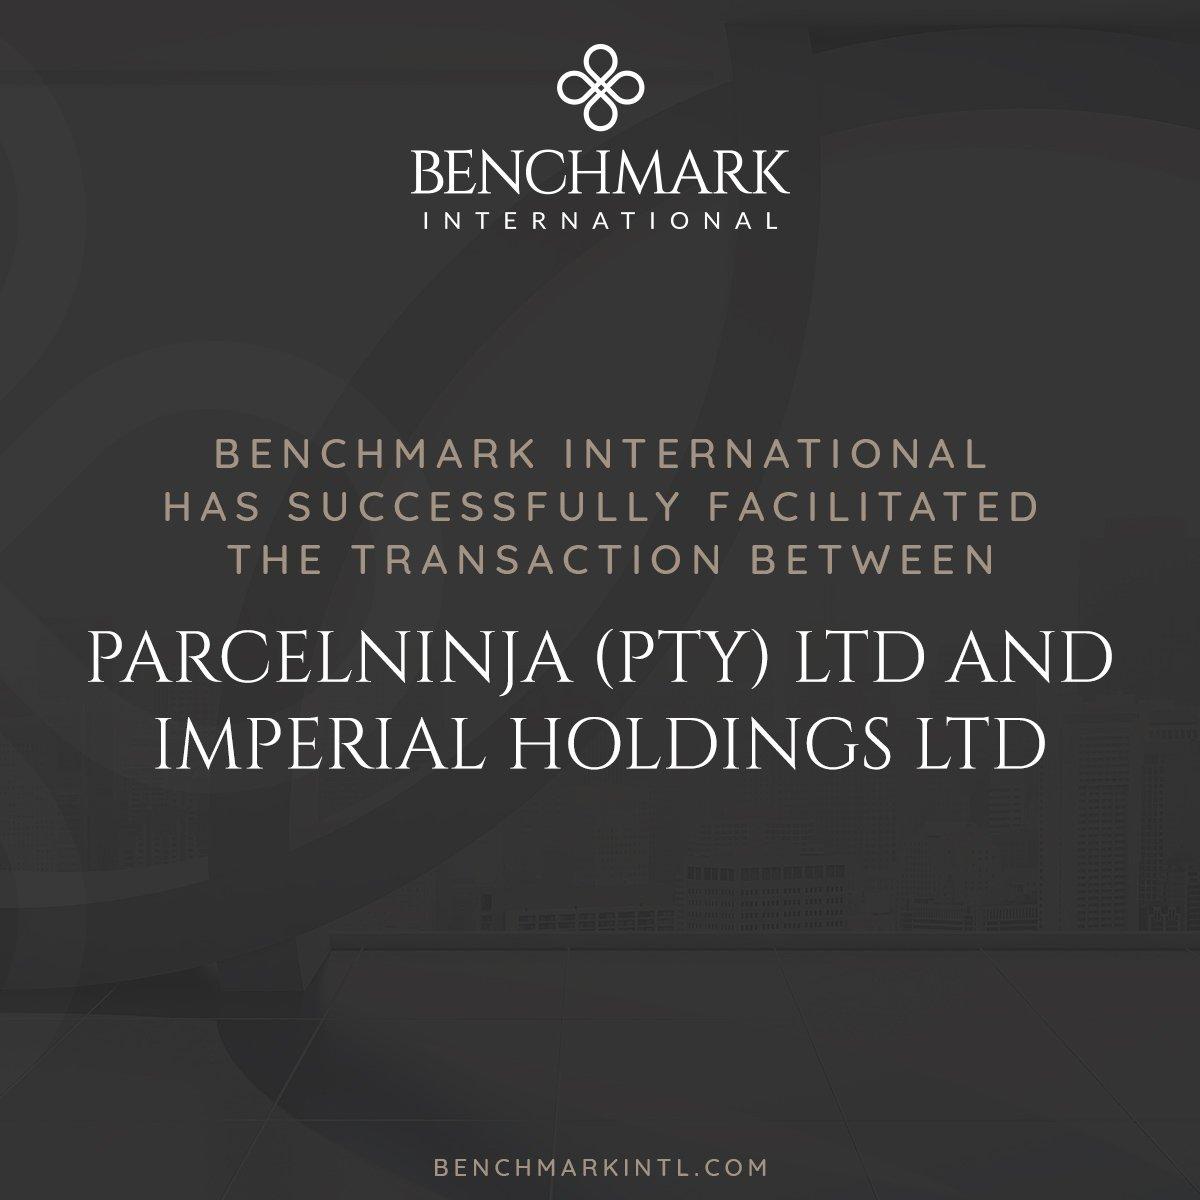 ParcelNinja_(Pty)_Ltd_and_Imperial_Holdings_Ltd._Social